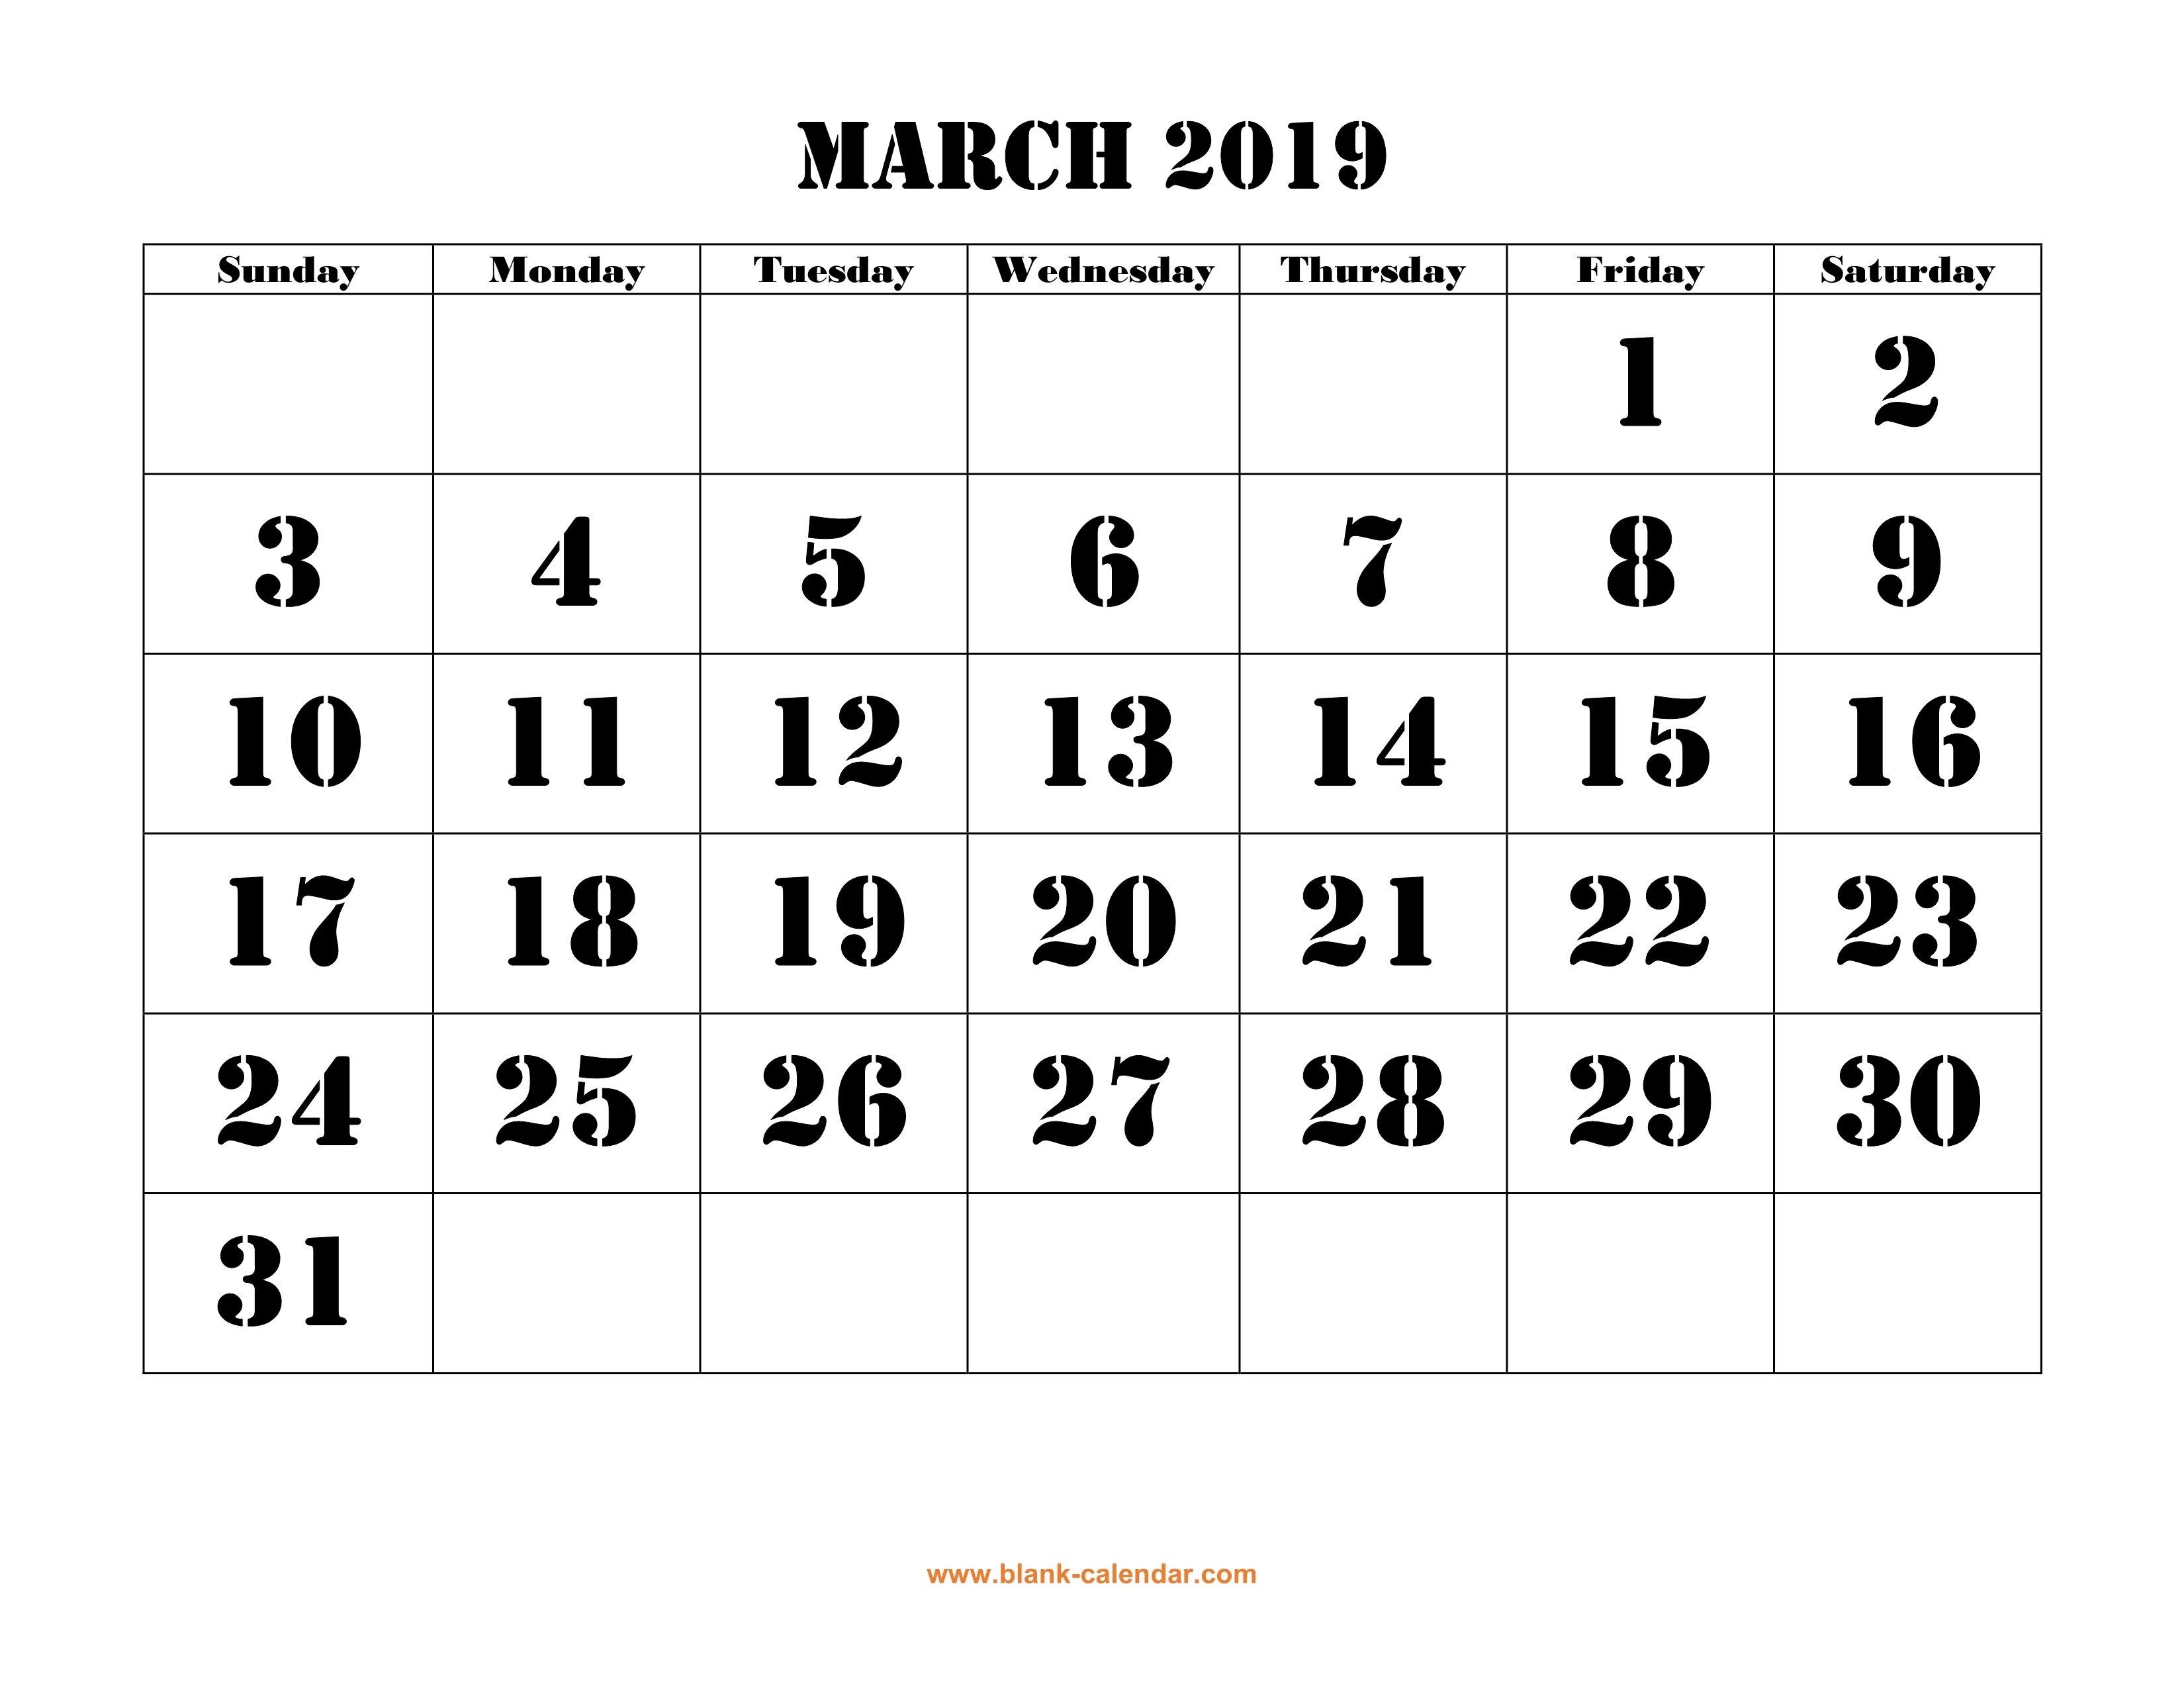 March 2019 Printable Calendar | Free Download Monthly Calendar Templates Calendar 2019 Large Print